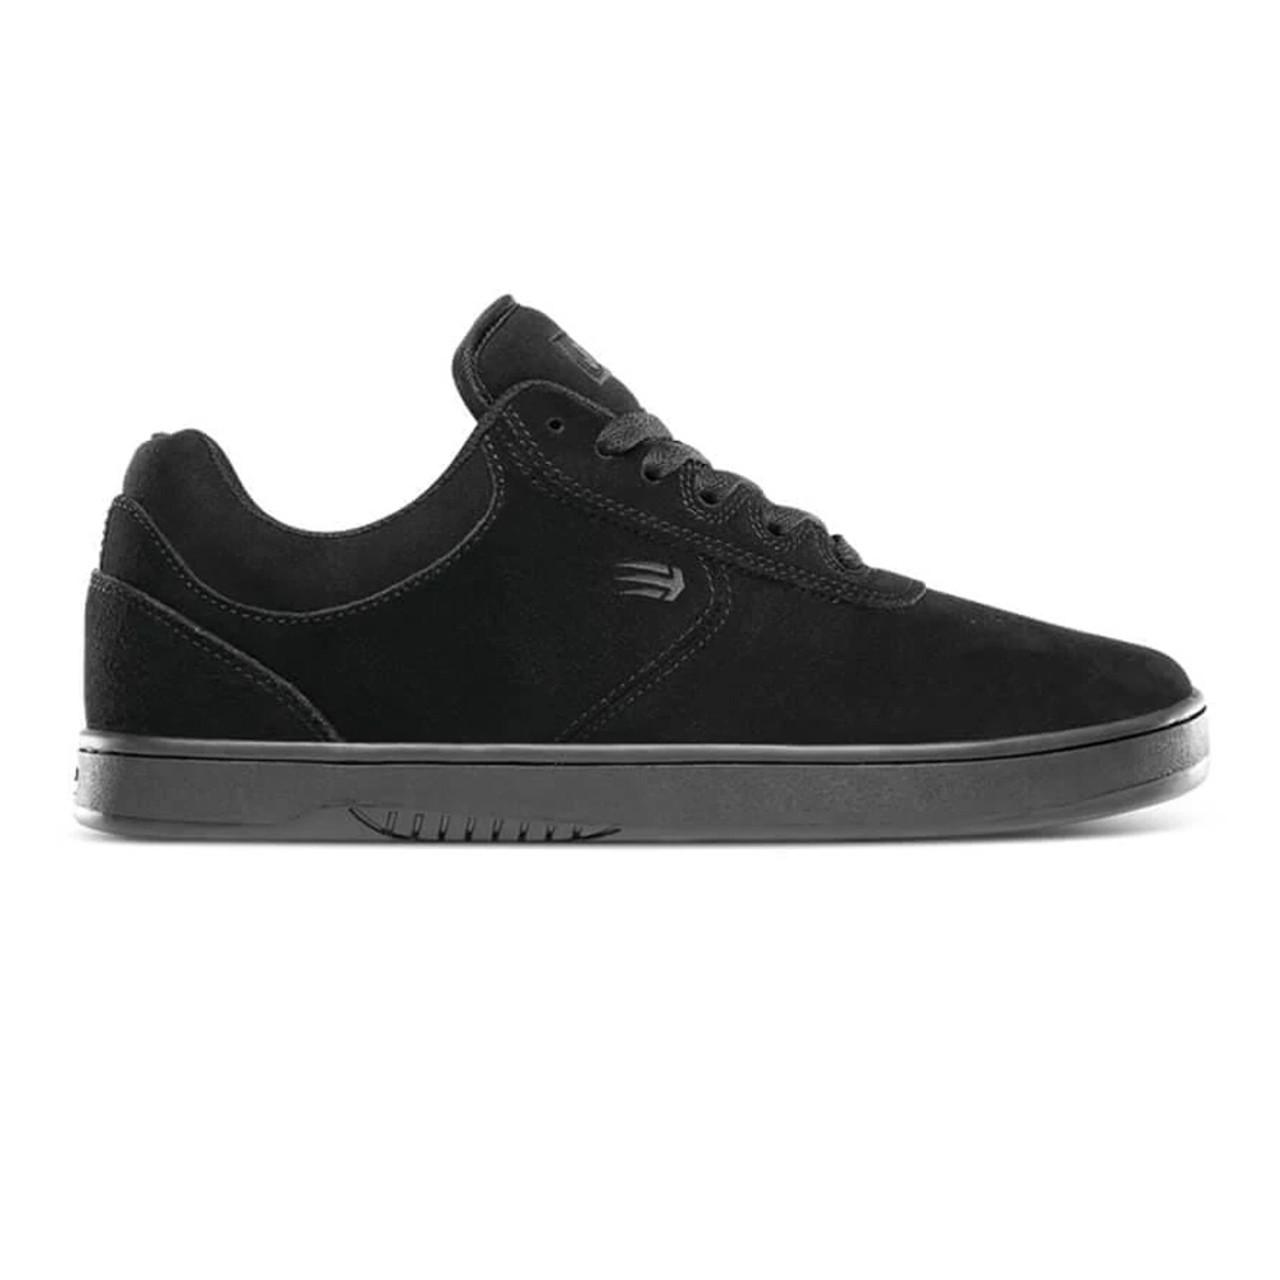 ETNIES Joslin Shoes Black